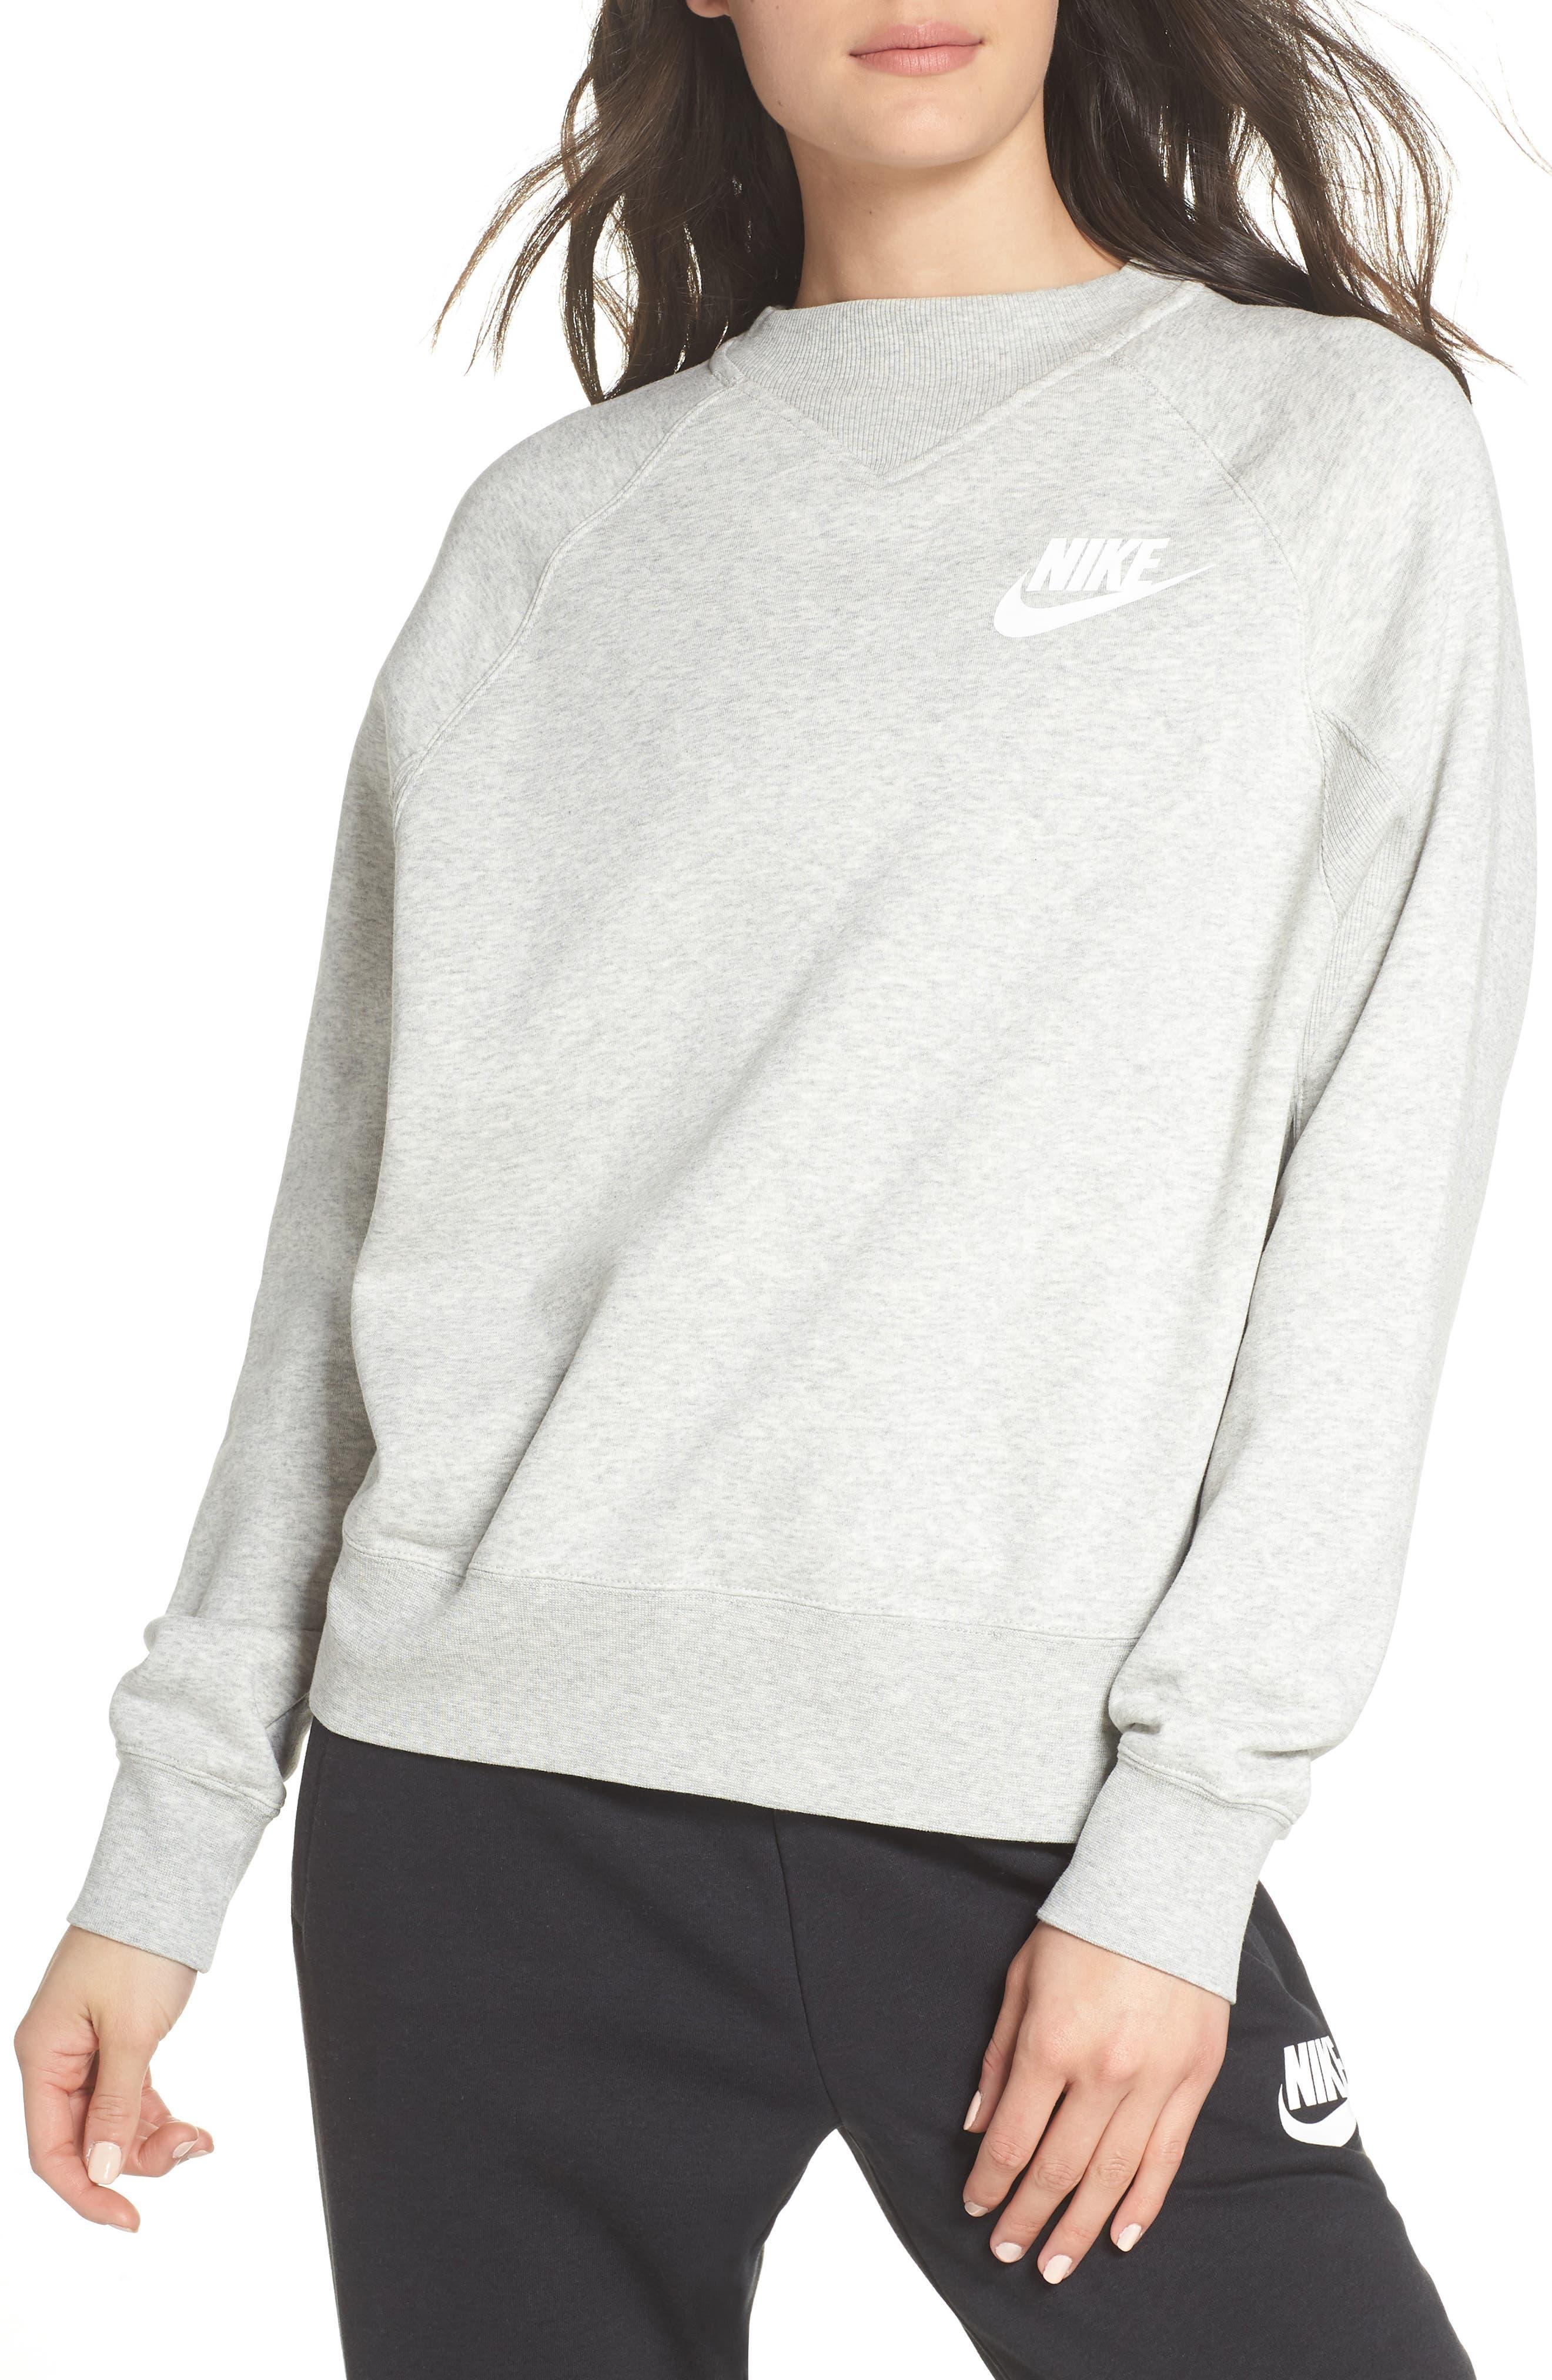 Sportswear Rally Sweatshirt,                             Main thumbnail 1, color,                             GREY HEATHER/ WHITE